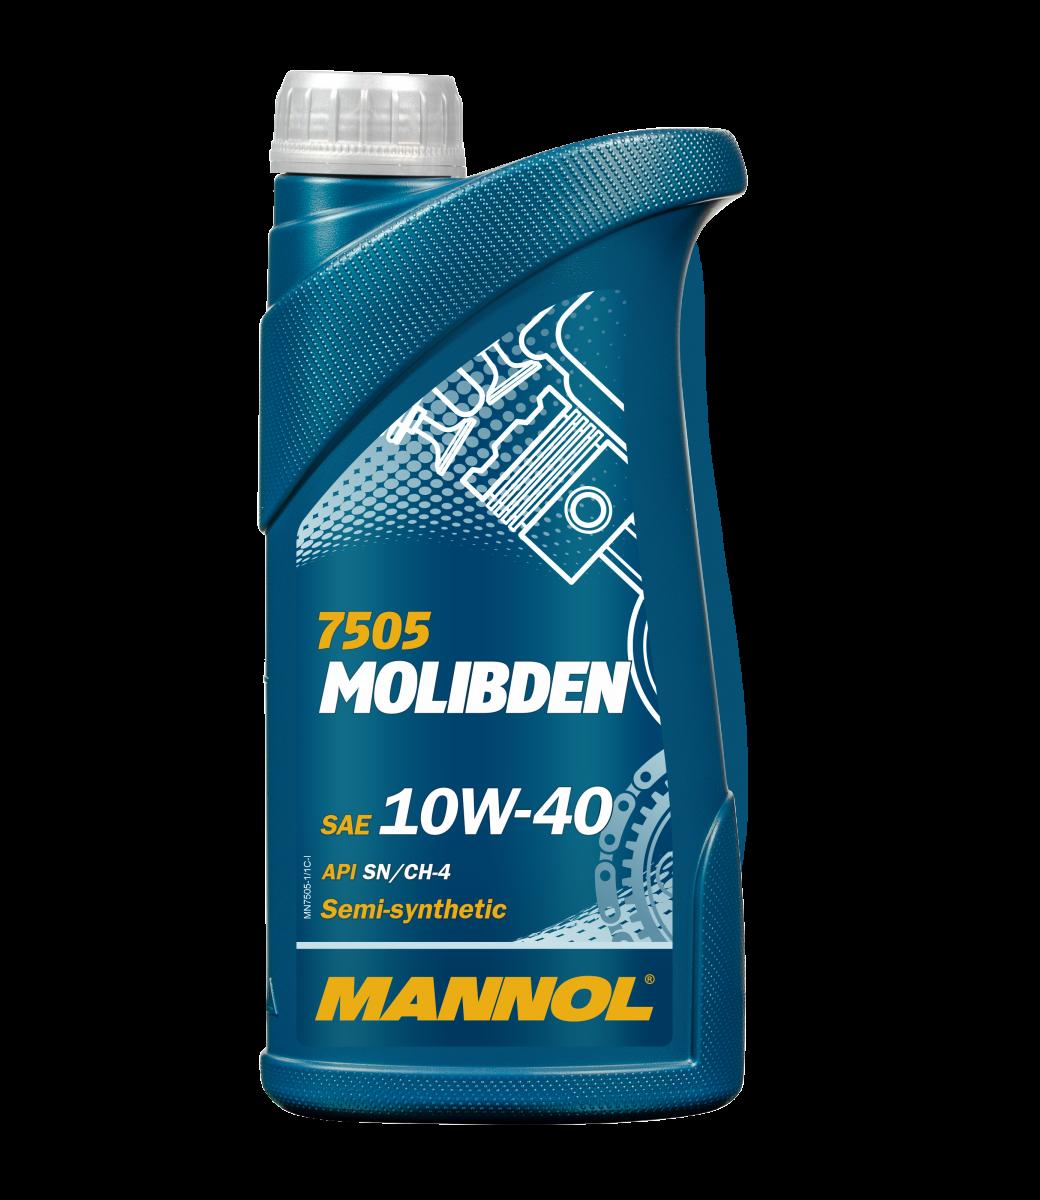 MANNOL Motoröl MN7505-1